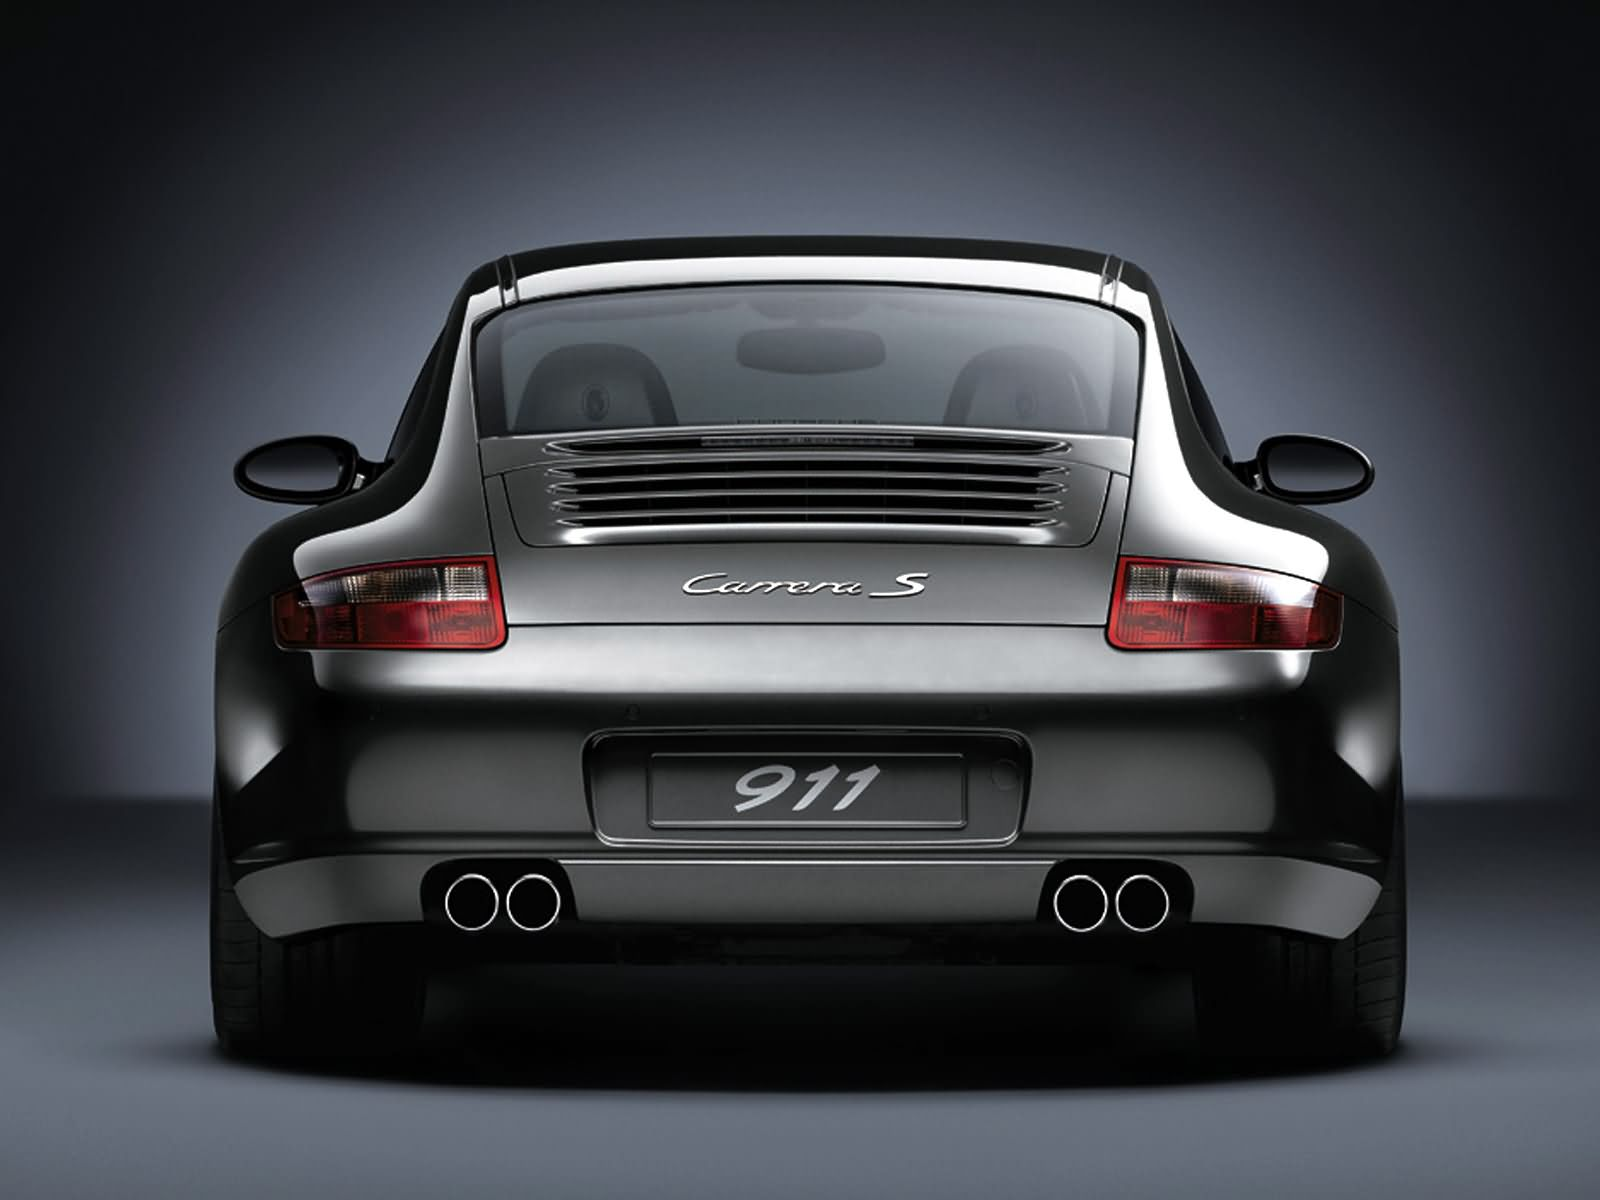 Porsche 997 carrera s wallpaper